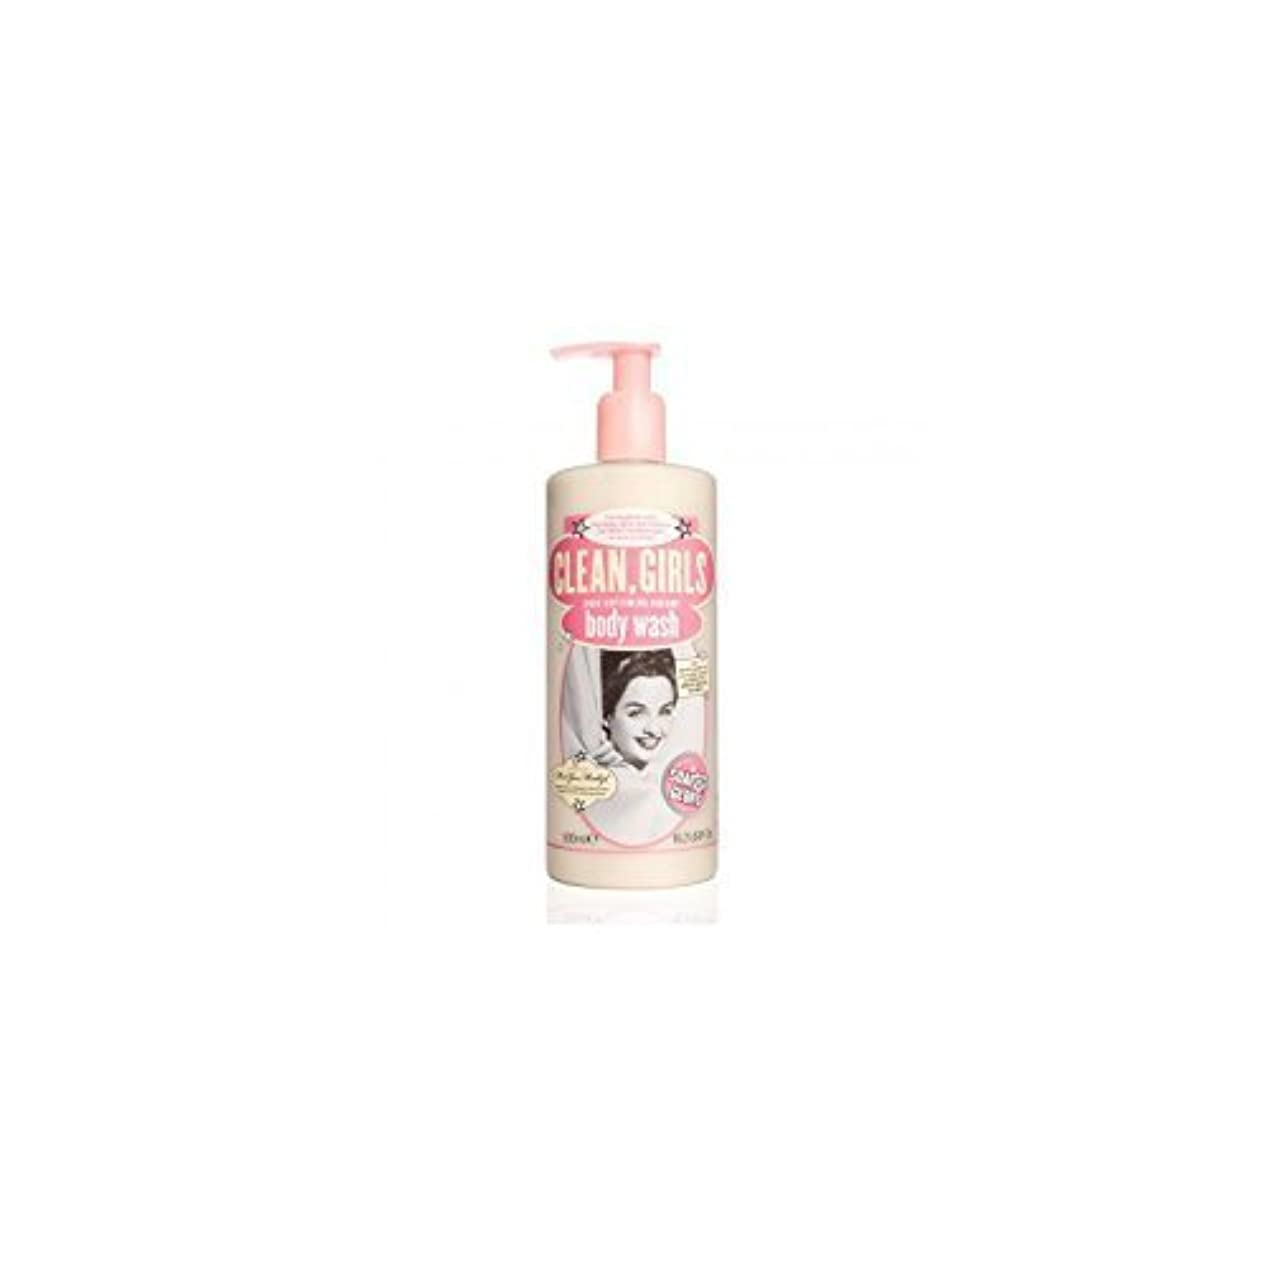 予報珍味処方Soap & Glory Clean Girls Body Wash 500ml by Trifing